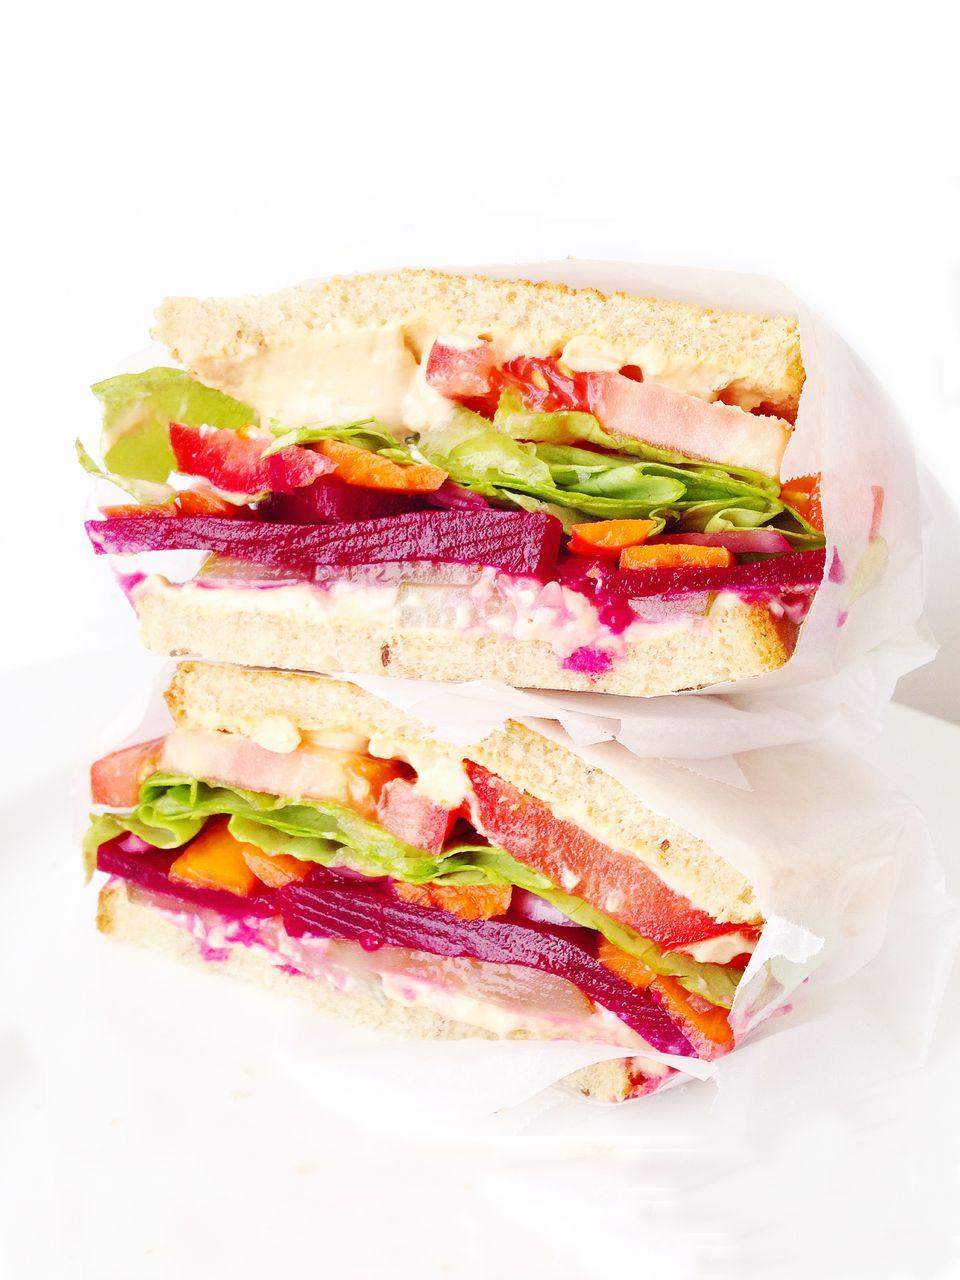 hummus-and-pickled-vegetable-sandwich-.jpg